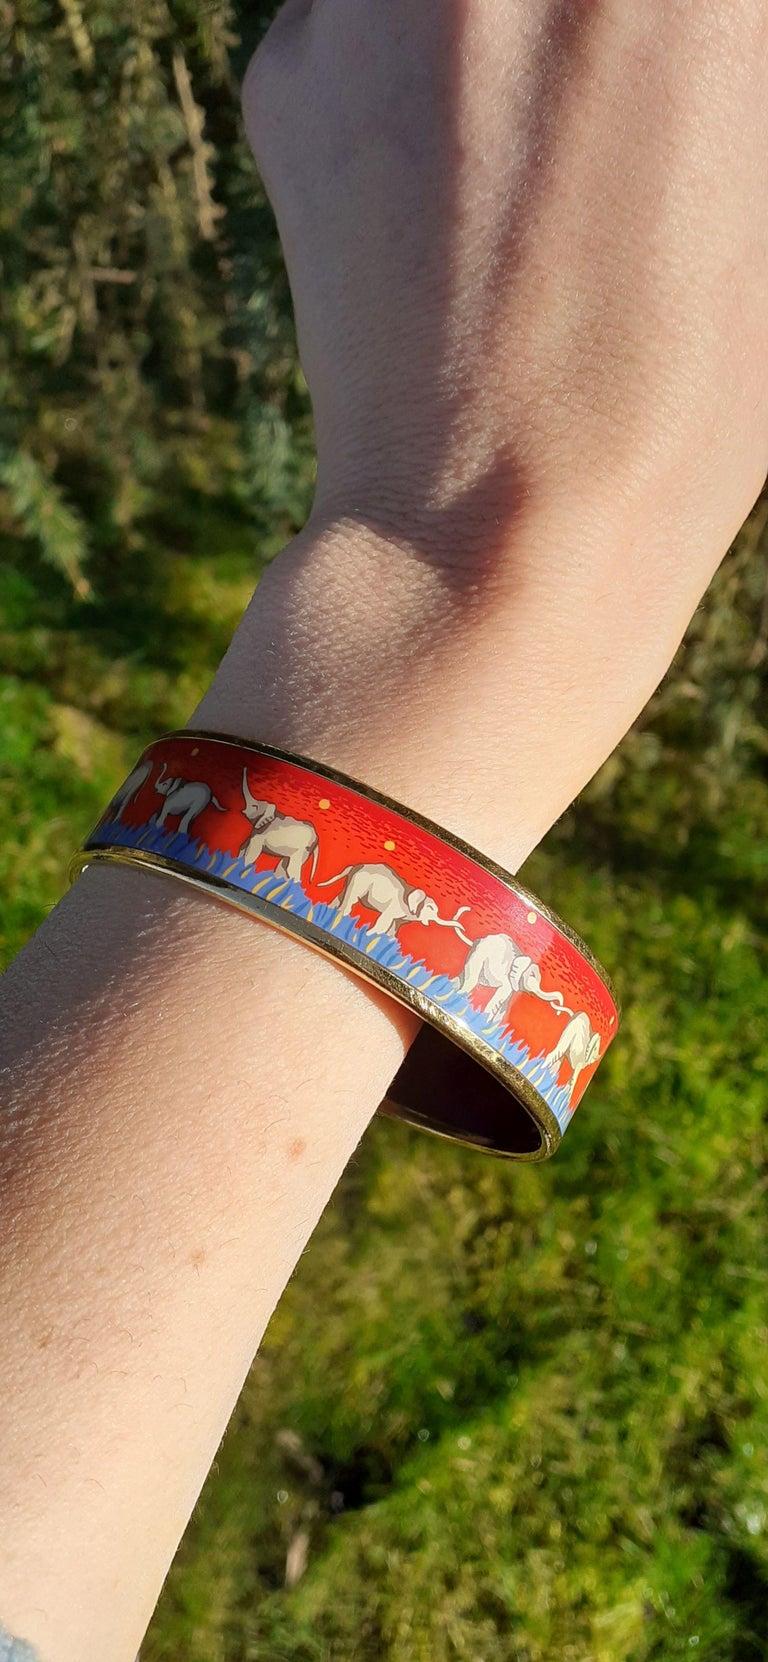 Hermès Enamel Printed Bracelet Elephants Grazing Red Ghw Large Size GM 70 For Sale 7